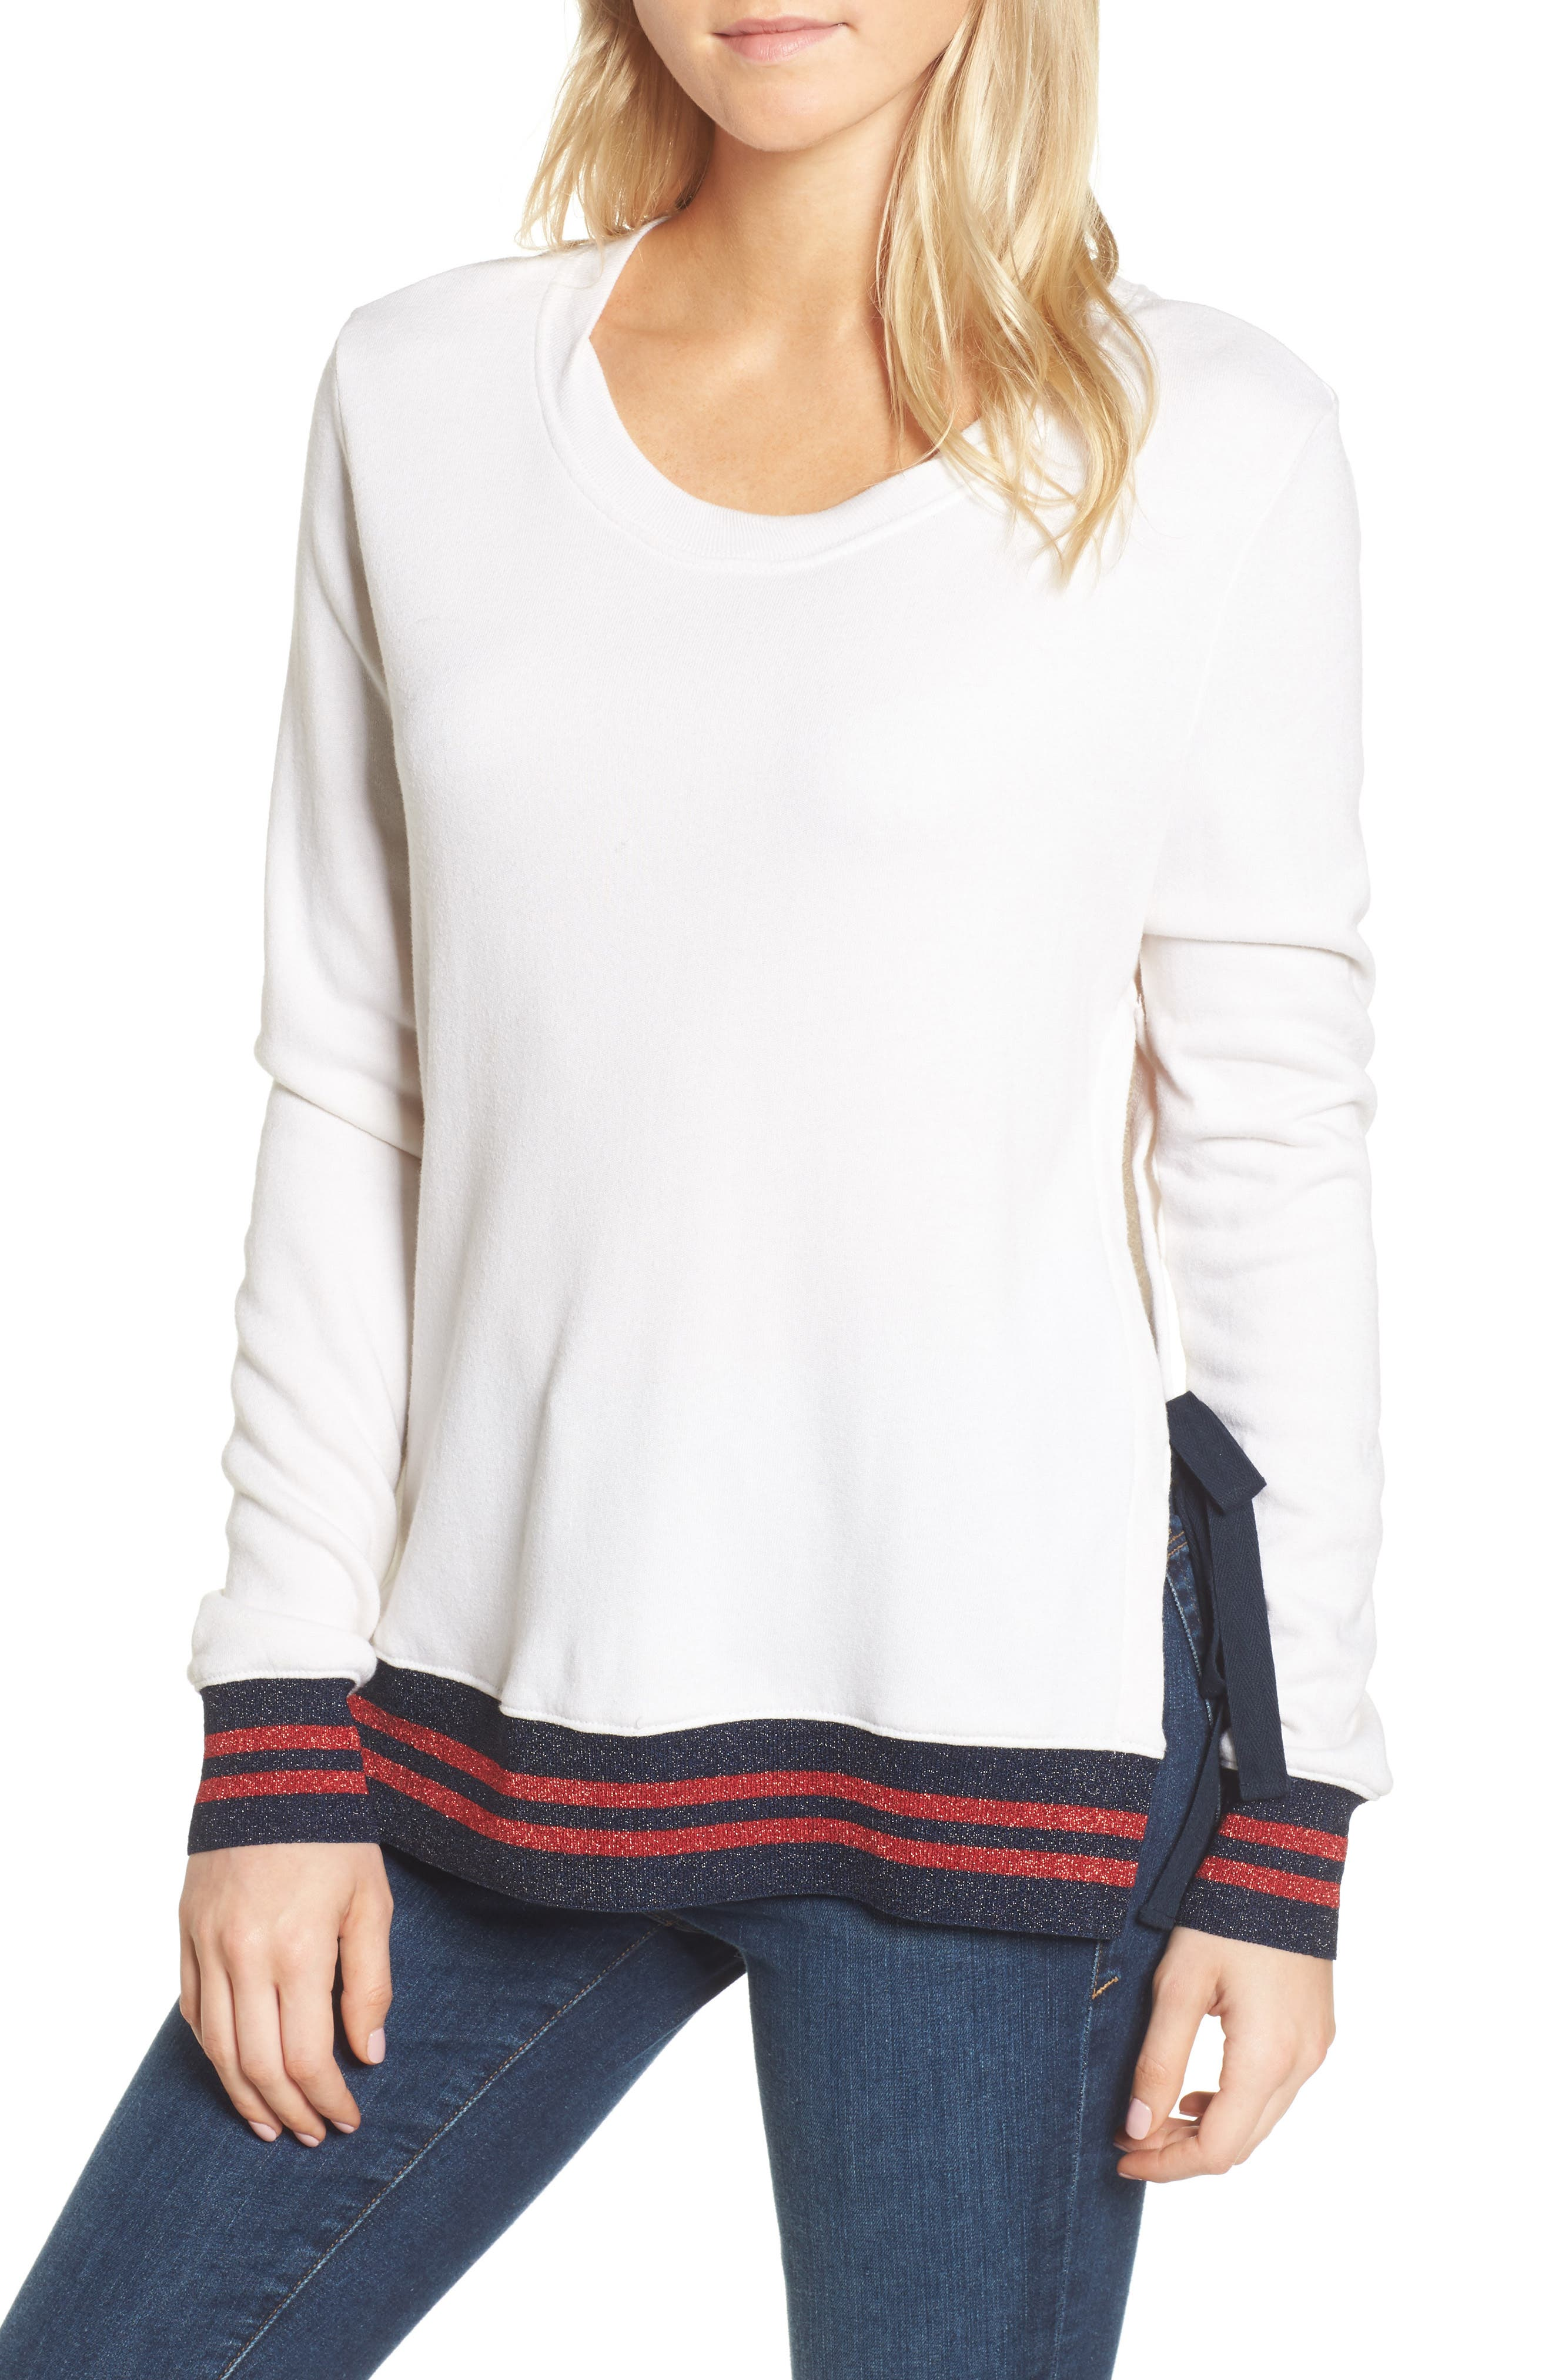 Main Image - Pam & Gela Side Slit Sweatshirt